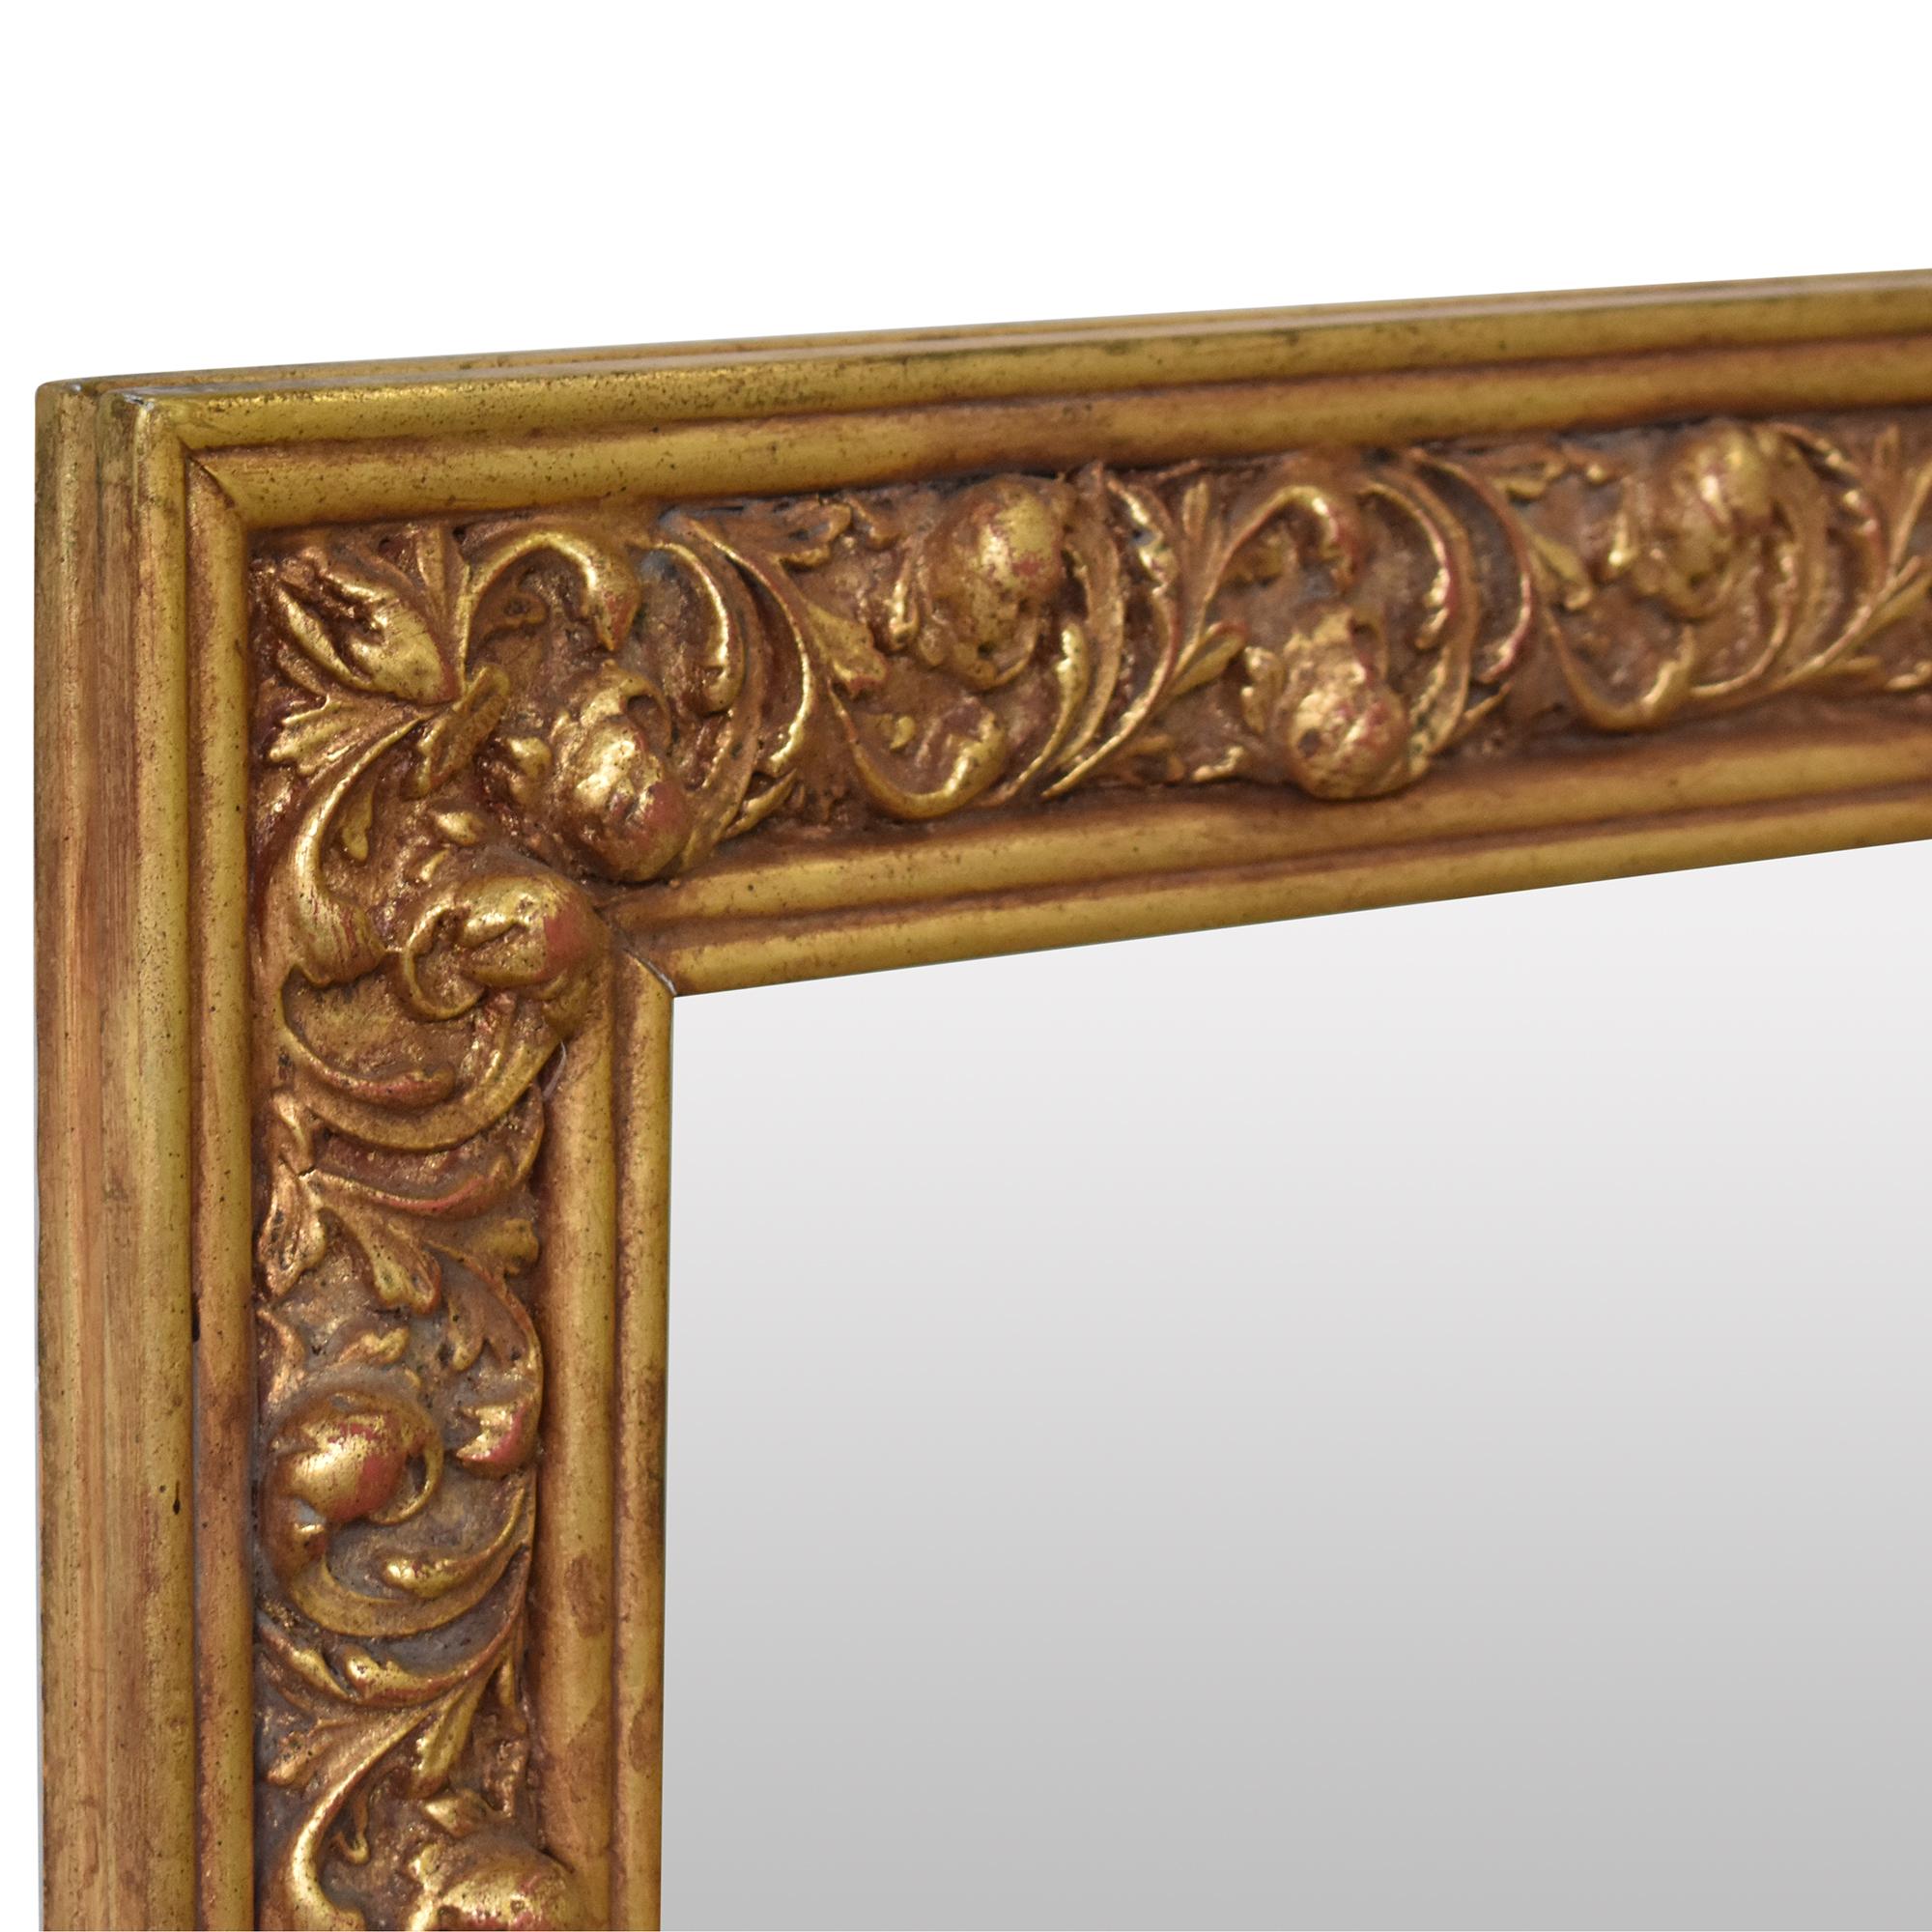 Friedman Brothers Friedman Brothers Decorative Arts Rectangular Wall Mirror Mirrors